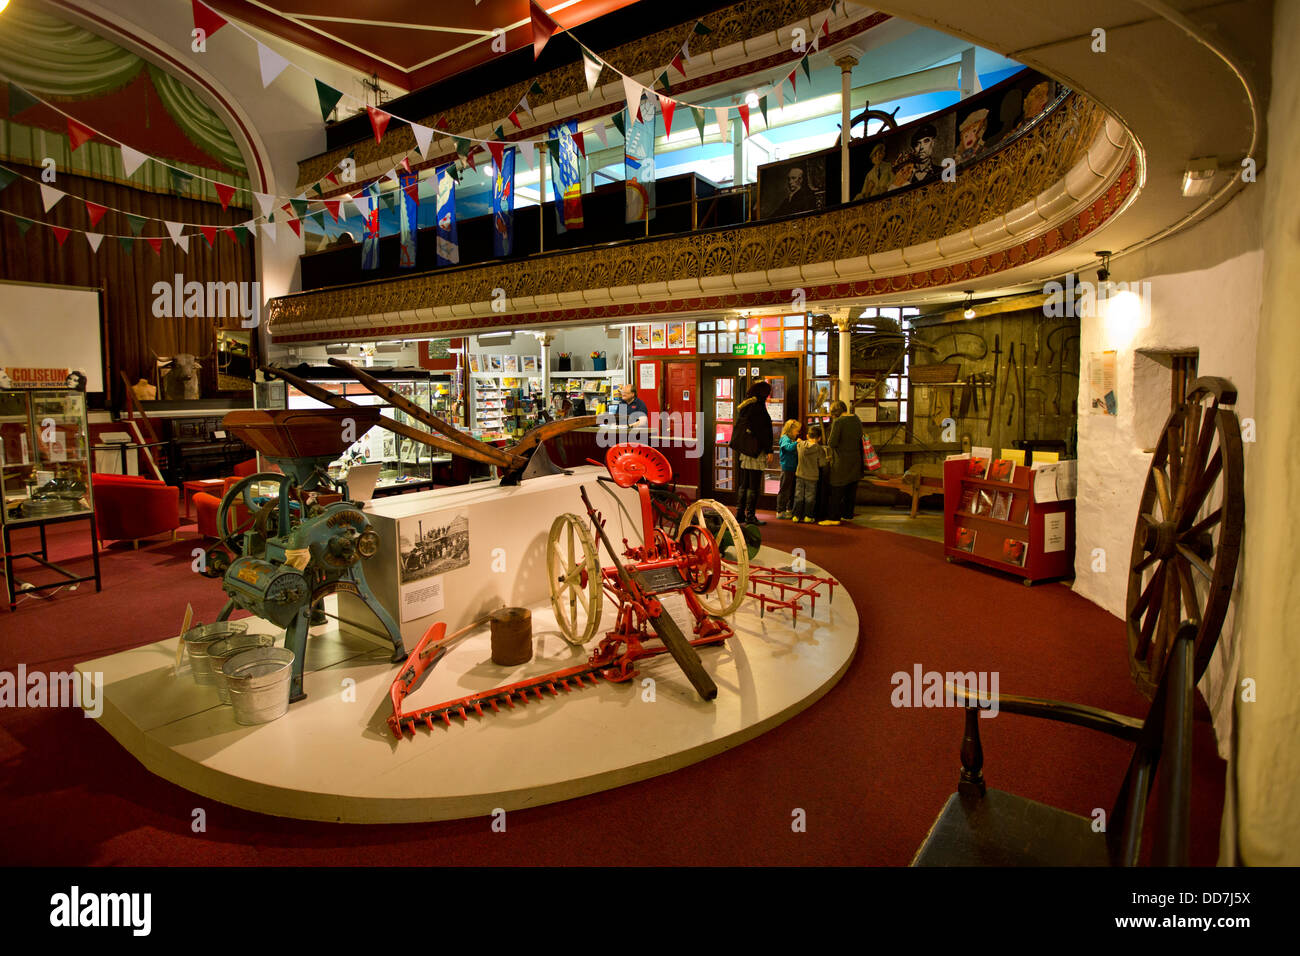 UK, Wales, Ceredigion, Aberystwyth, Terrace Road, Ceredigion Museum, interior - Stock Image